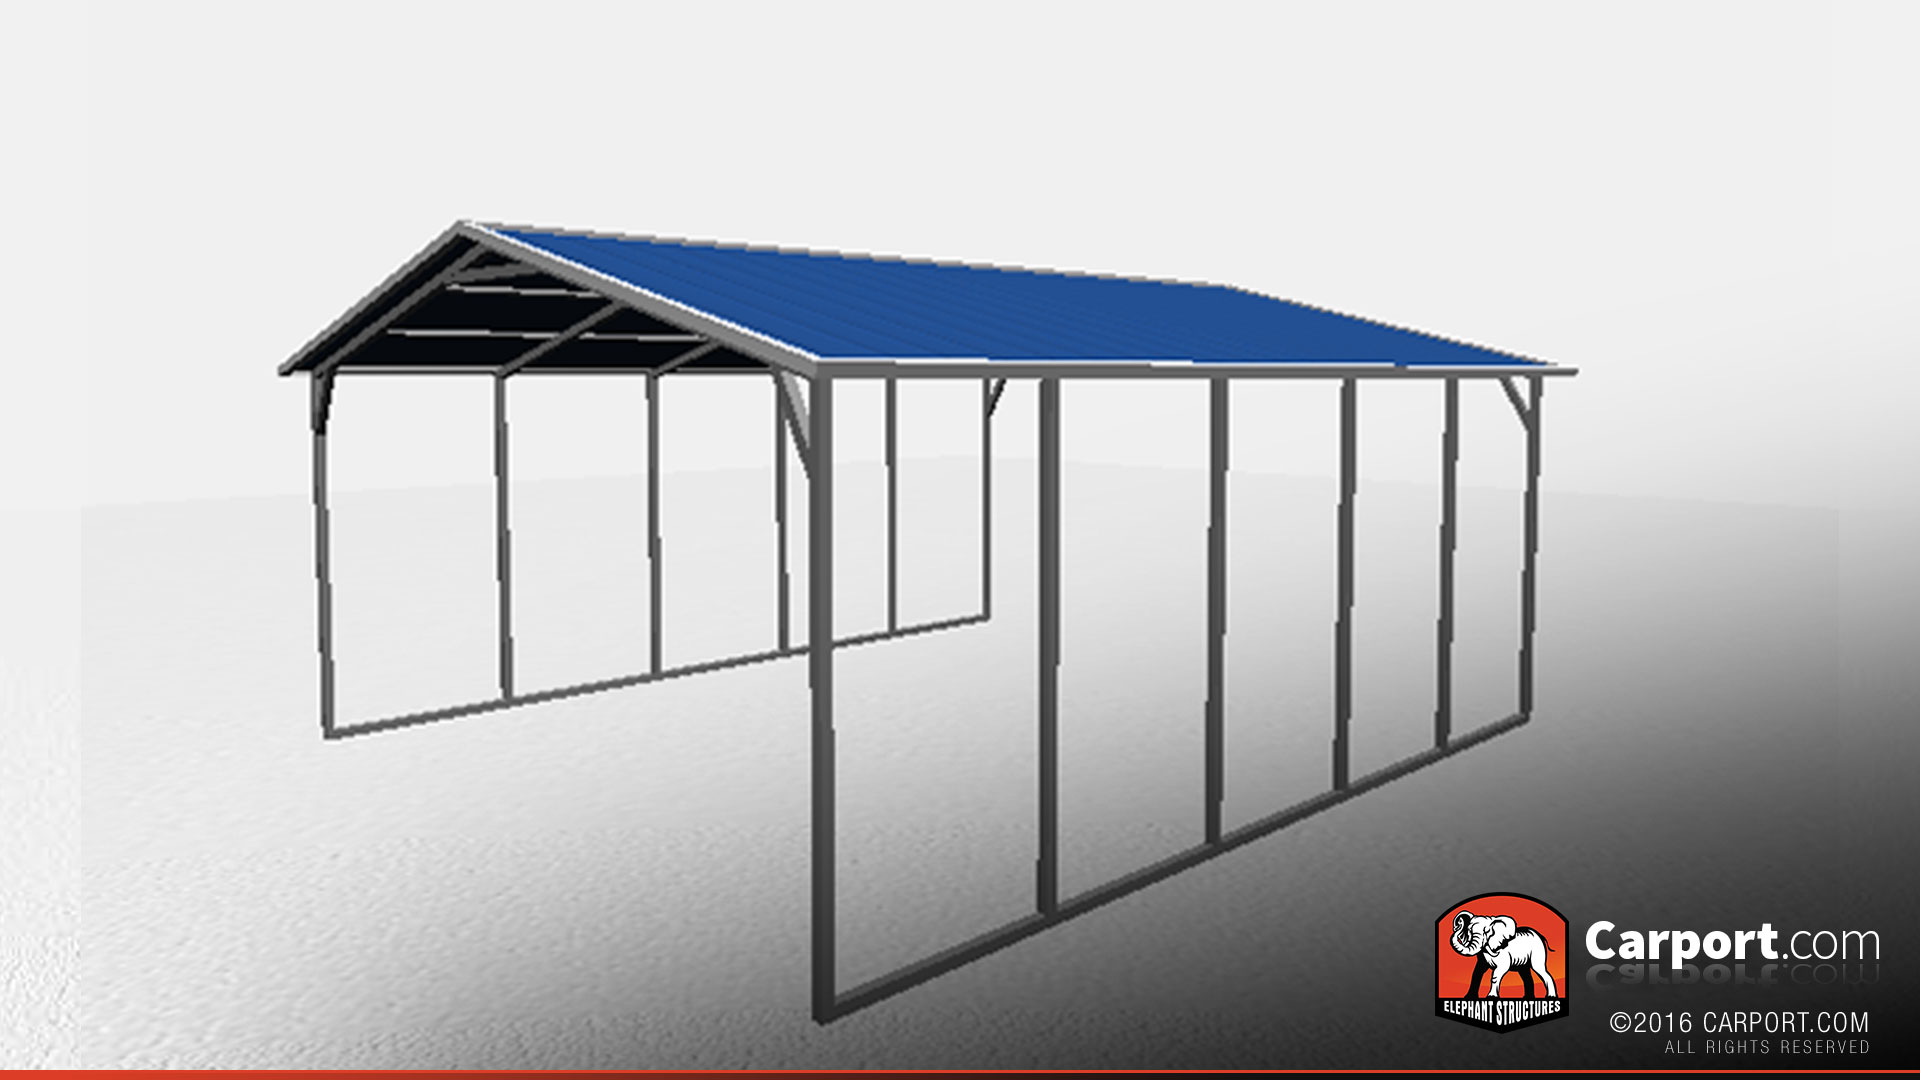 10 18 Metal Carport : Vertical roof metal carport shelter